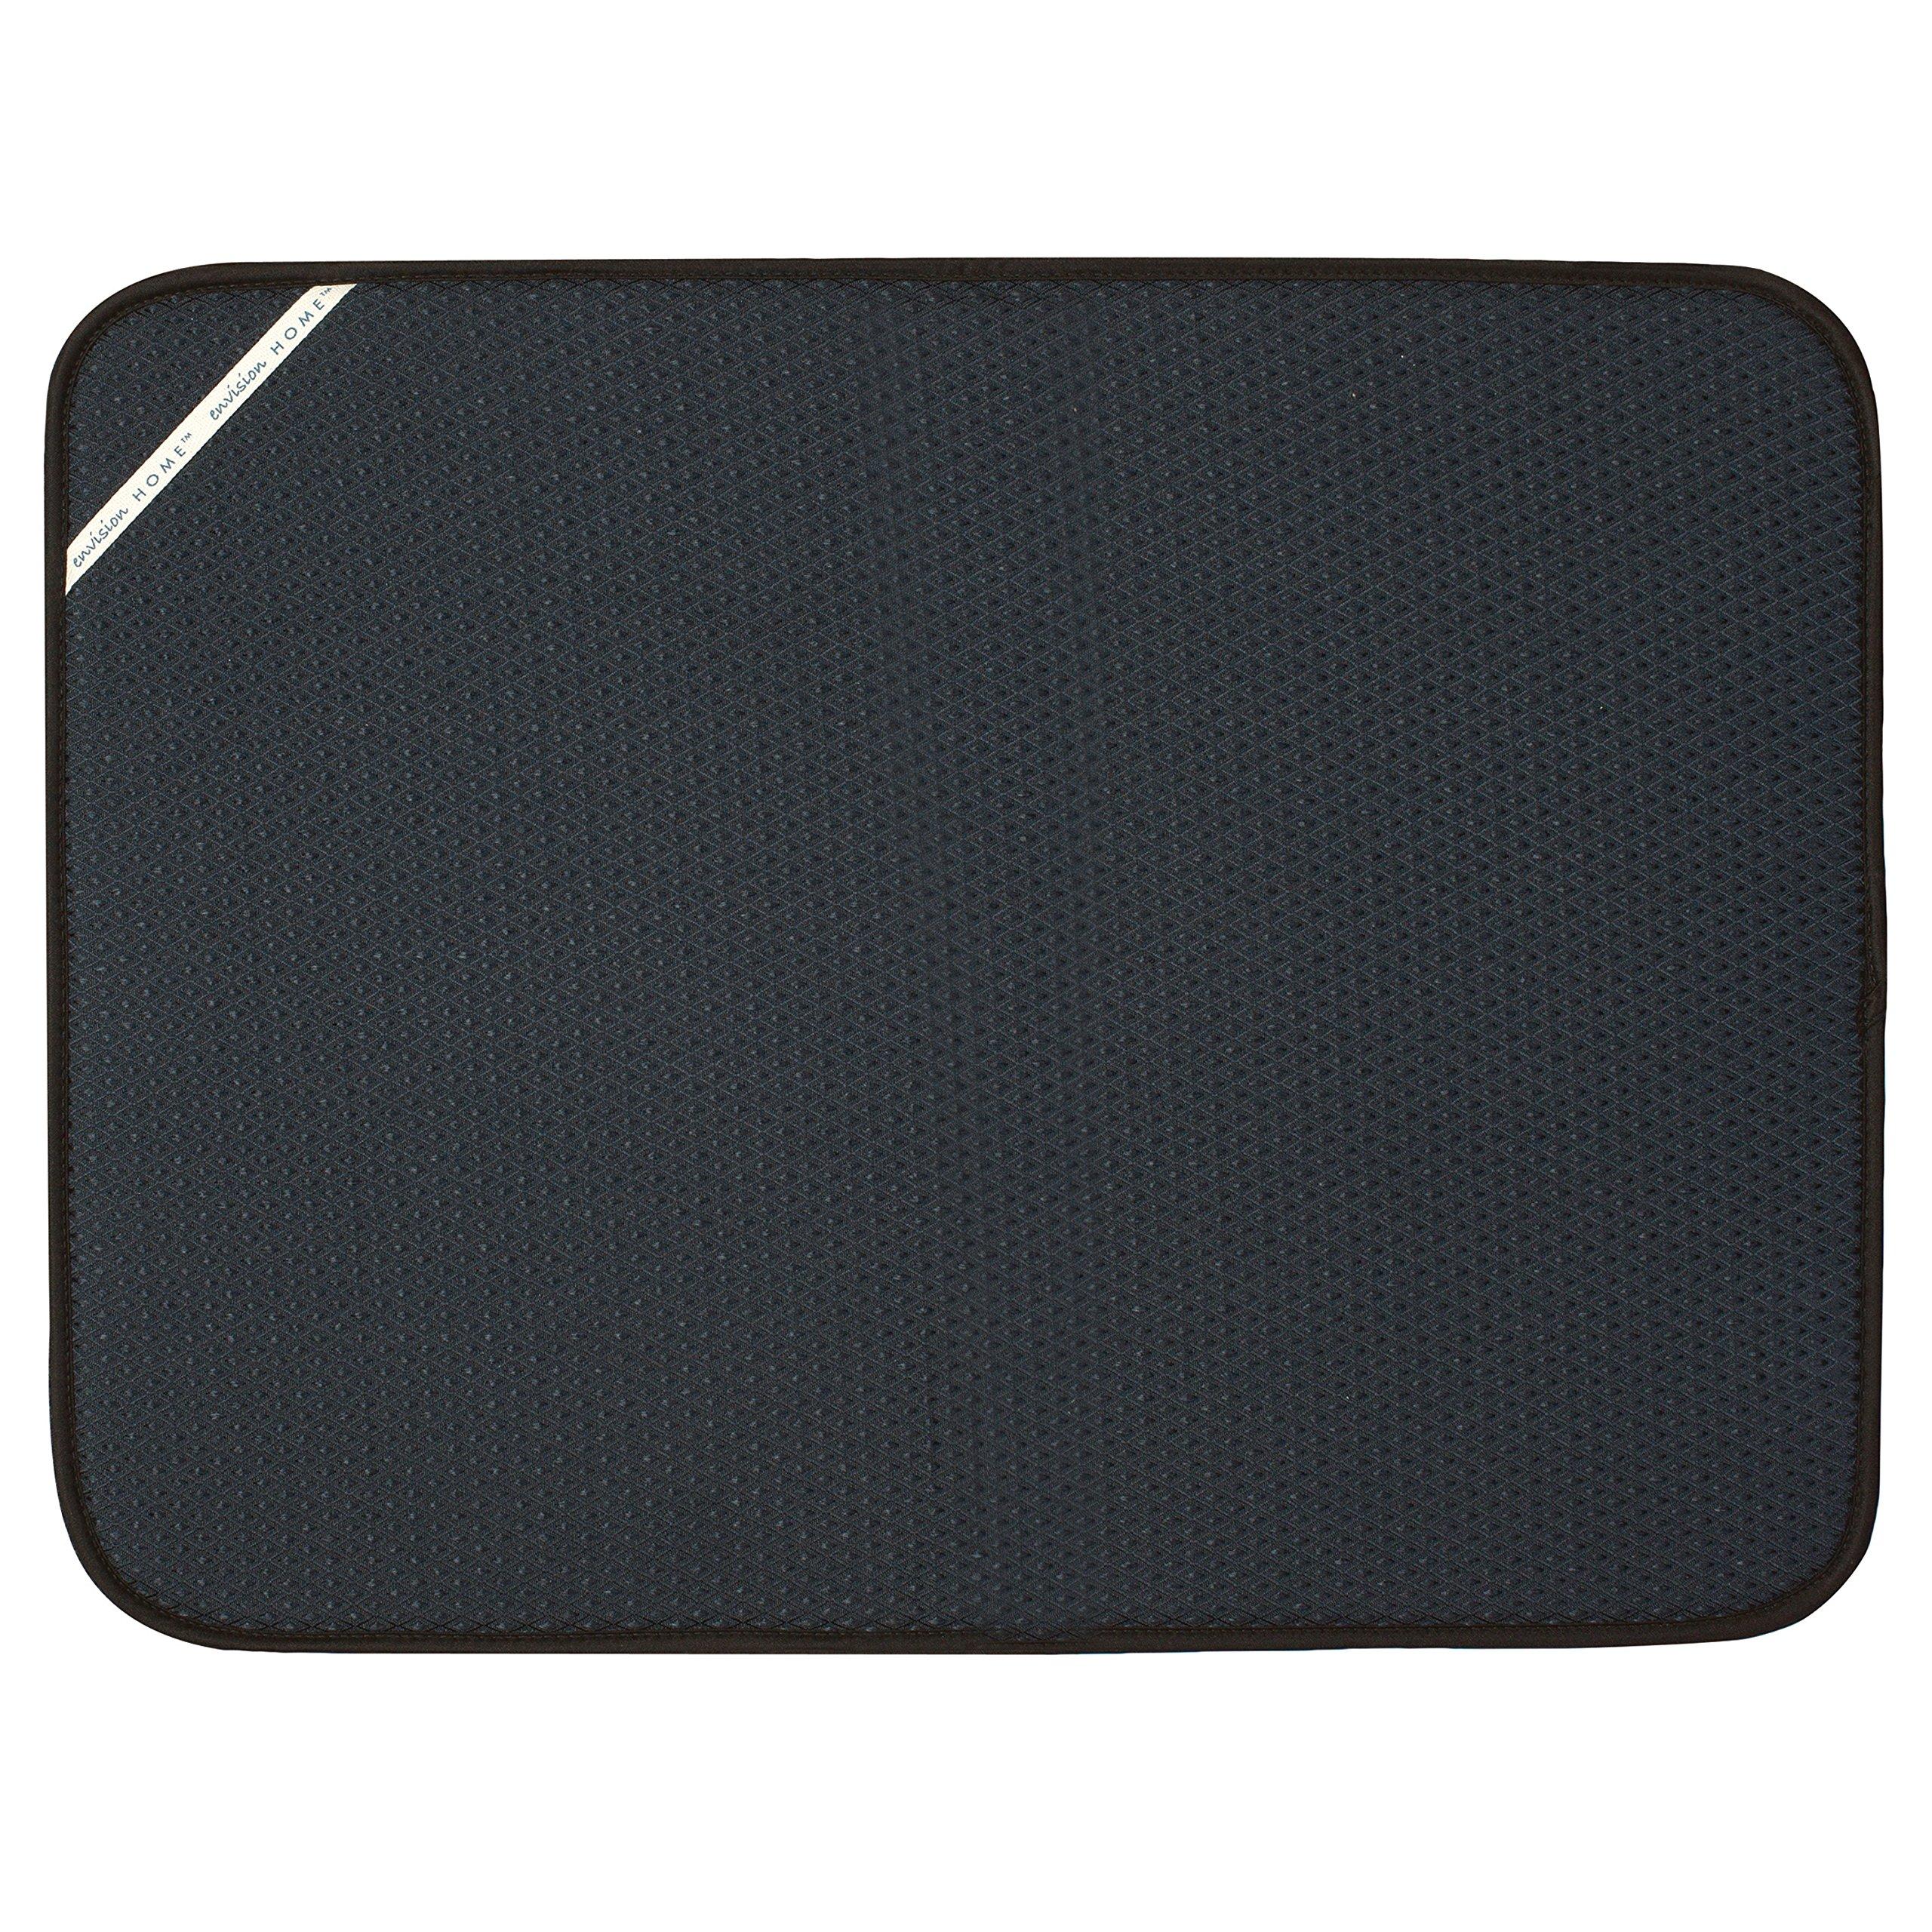 Envision Home 432801 24 Inch Microfiber